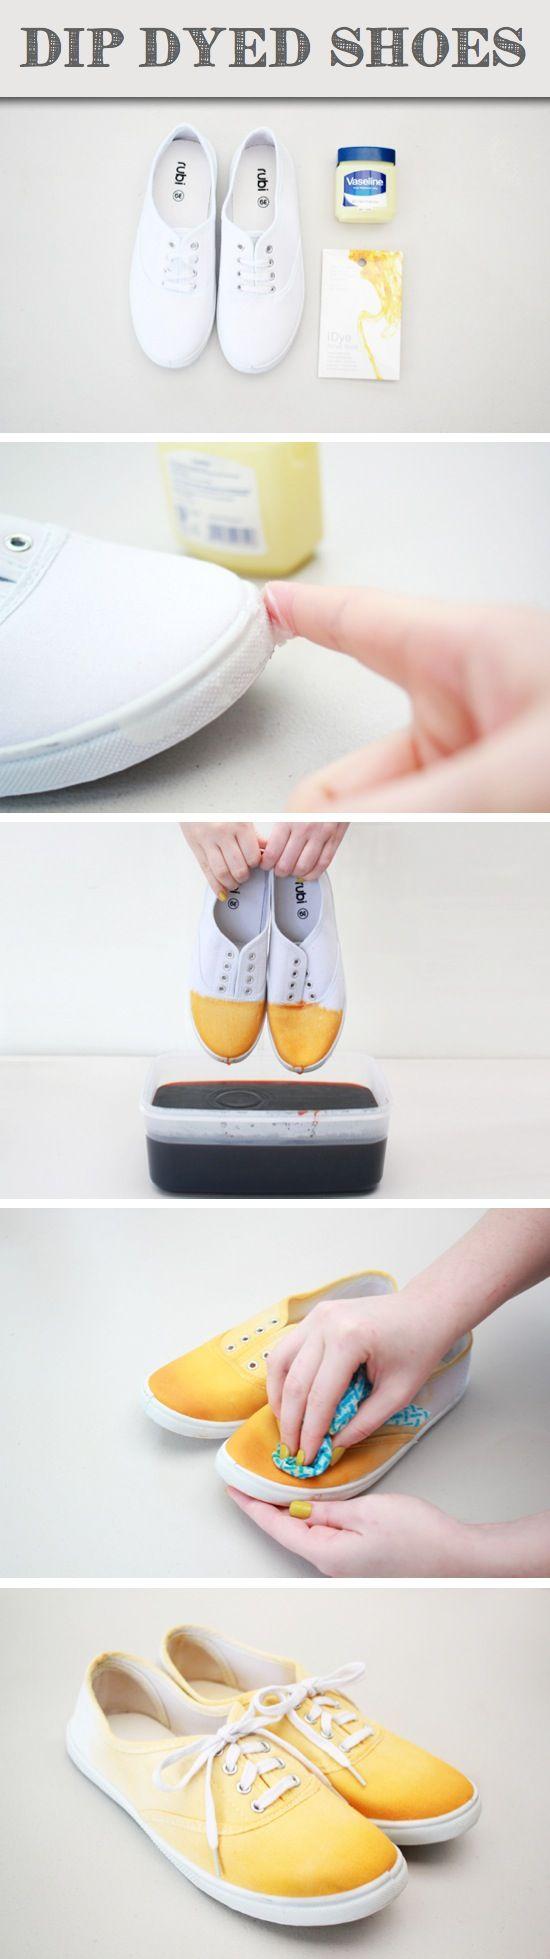 Tie & Dye Shoes by craftbyphoto #DIY #Does #Dip_Dye